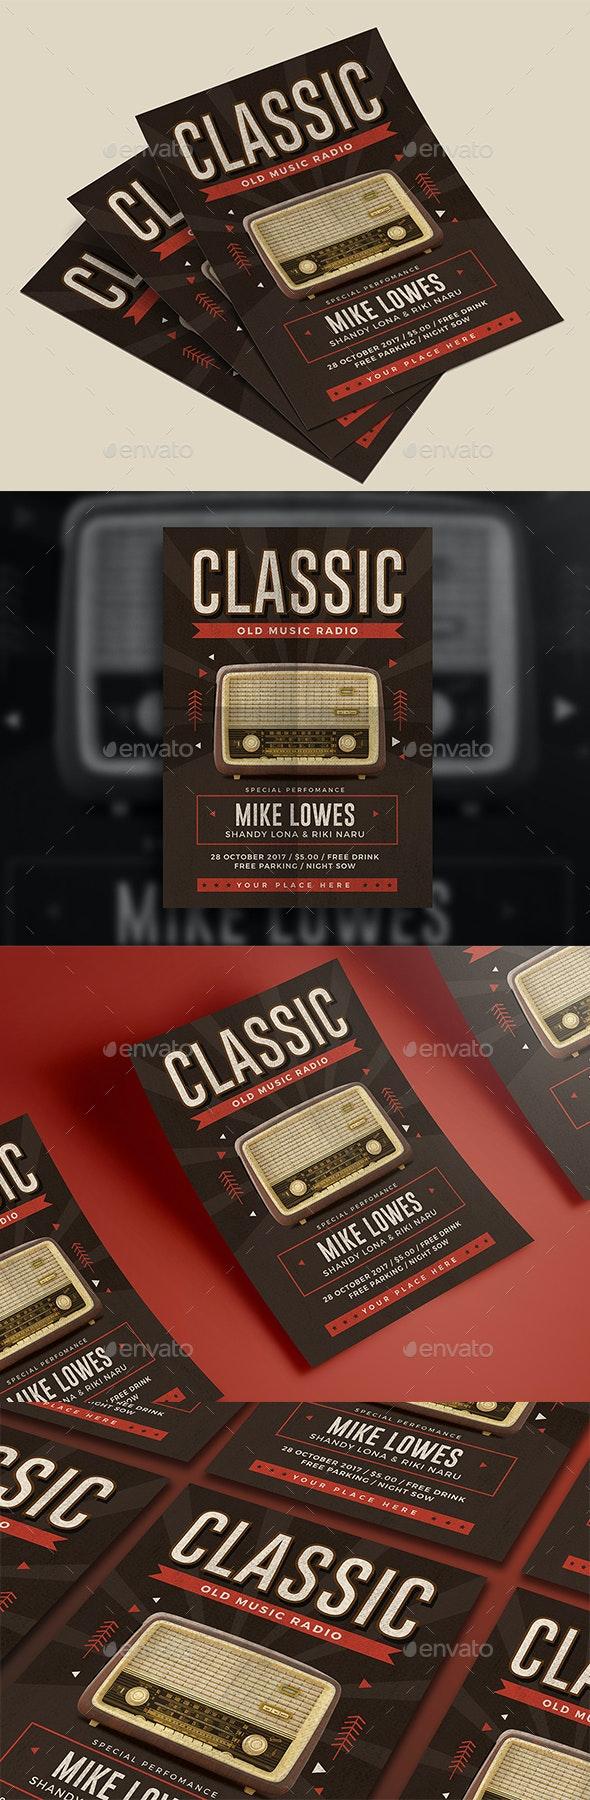 Classic Radio Flyer - Events Flyers